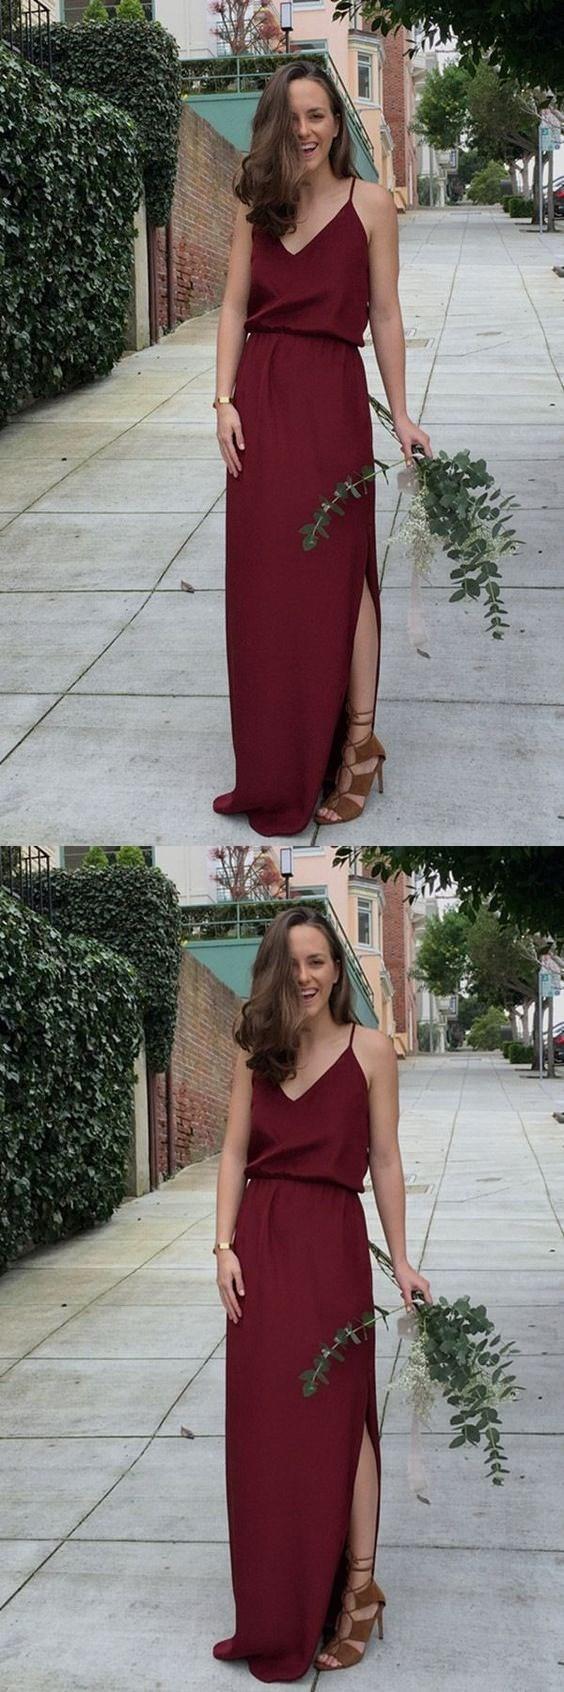 V-Neck Floor-Length Burgundy Bridesmaid Dress, Burgundy A-line Prom Dress